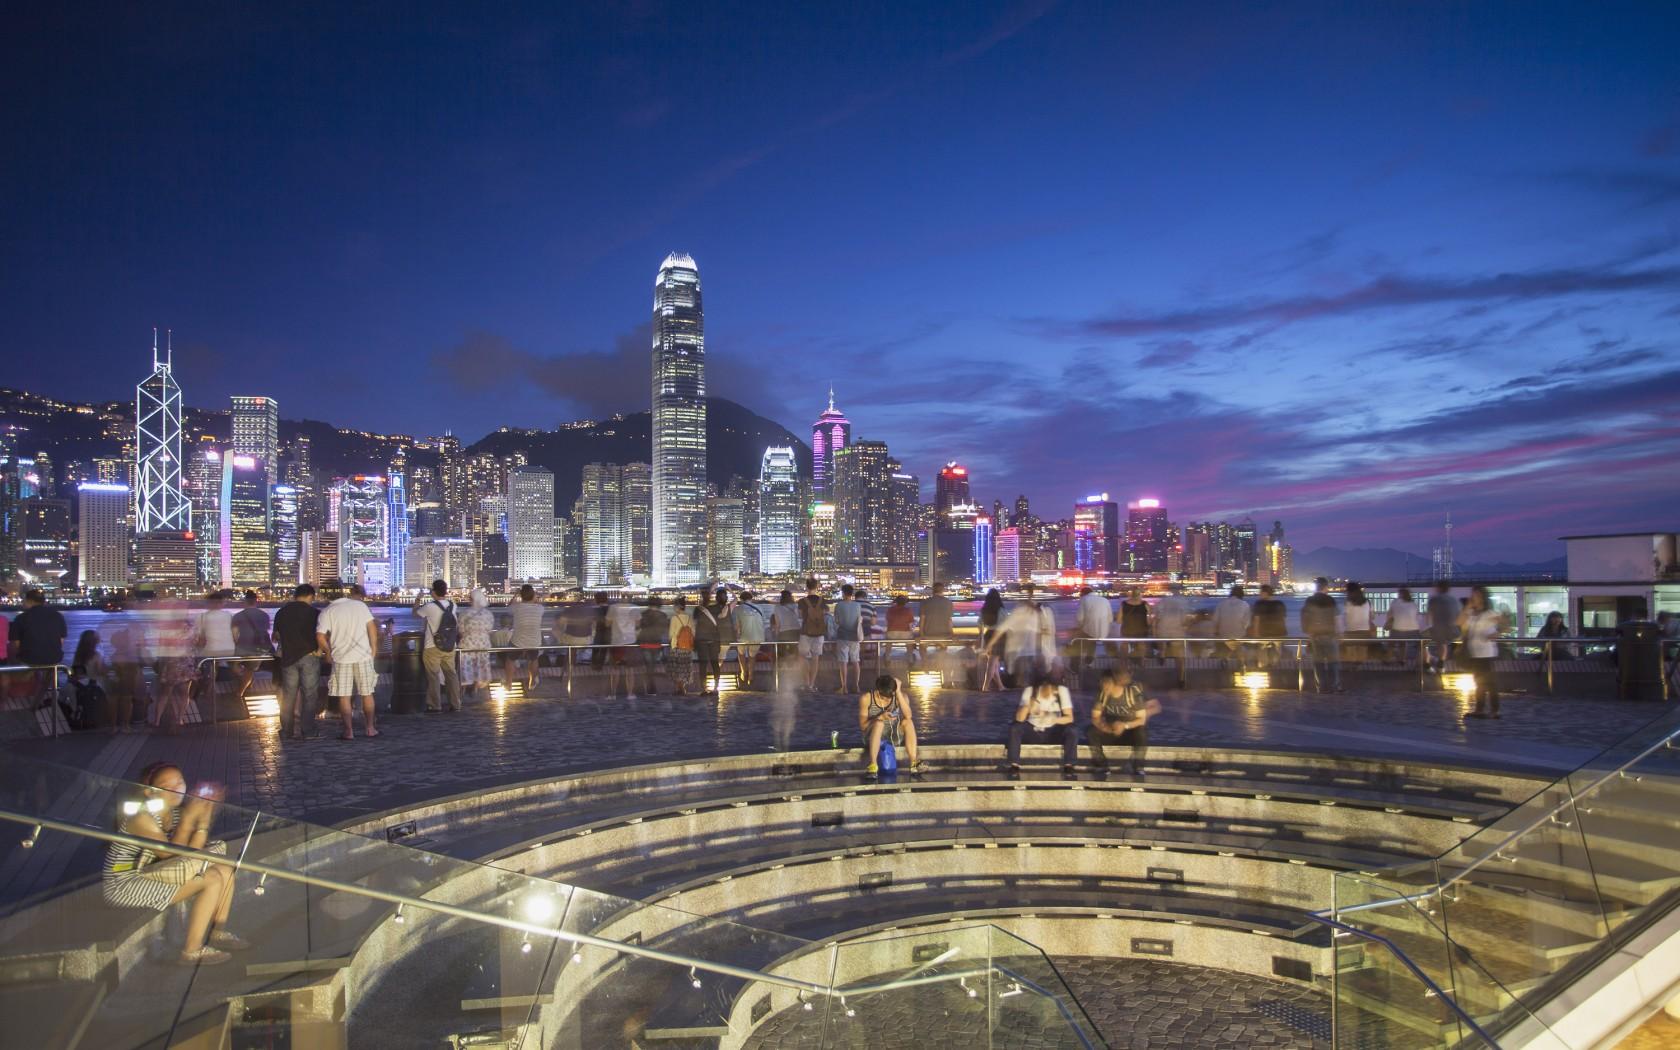 14.-Edited-Hong-Kong-AWL_CH10306AW-1680x1050